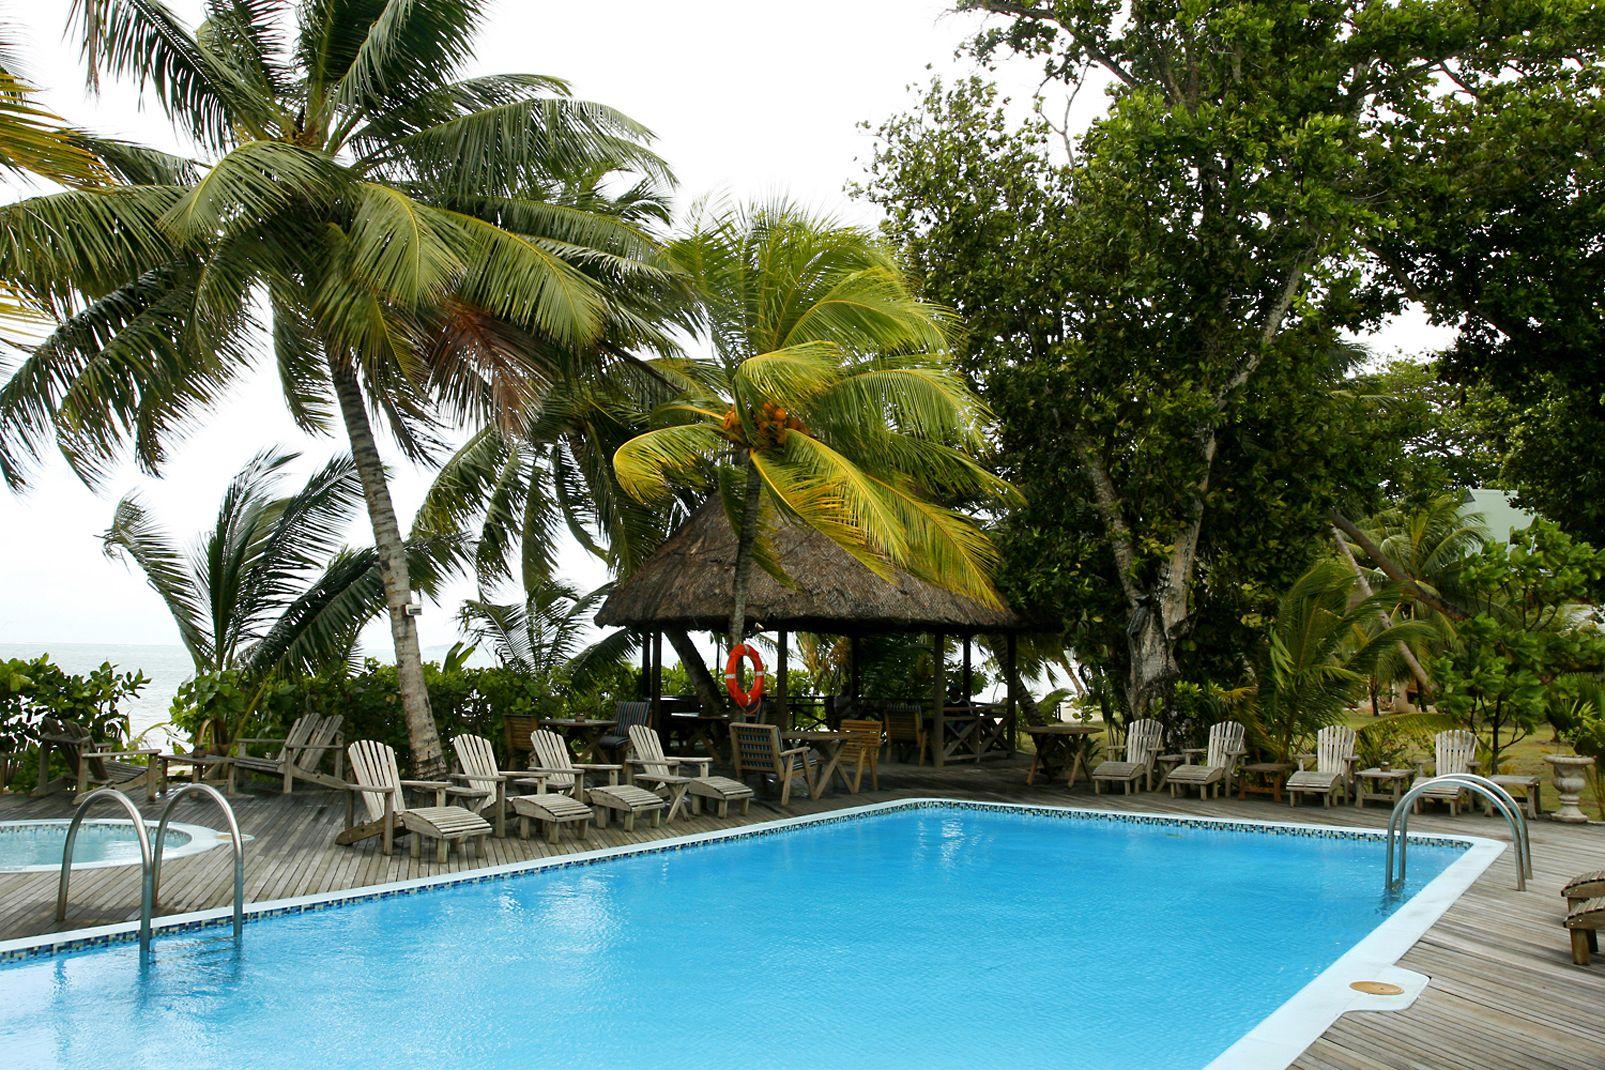 Combiné 3 Iles : Praslin + La Digue + Mahé : Indian Ocean Lodge + La Digue Lodge + Valmer - 1